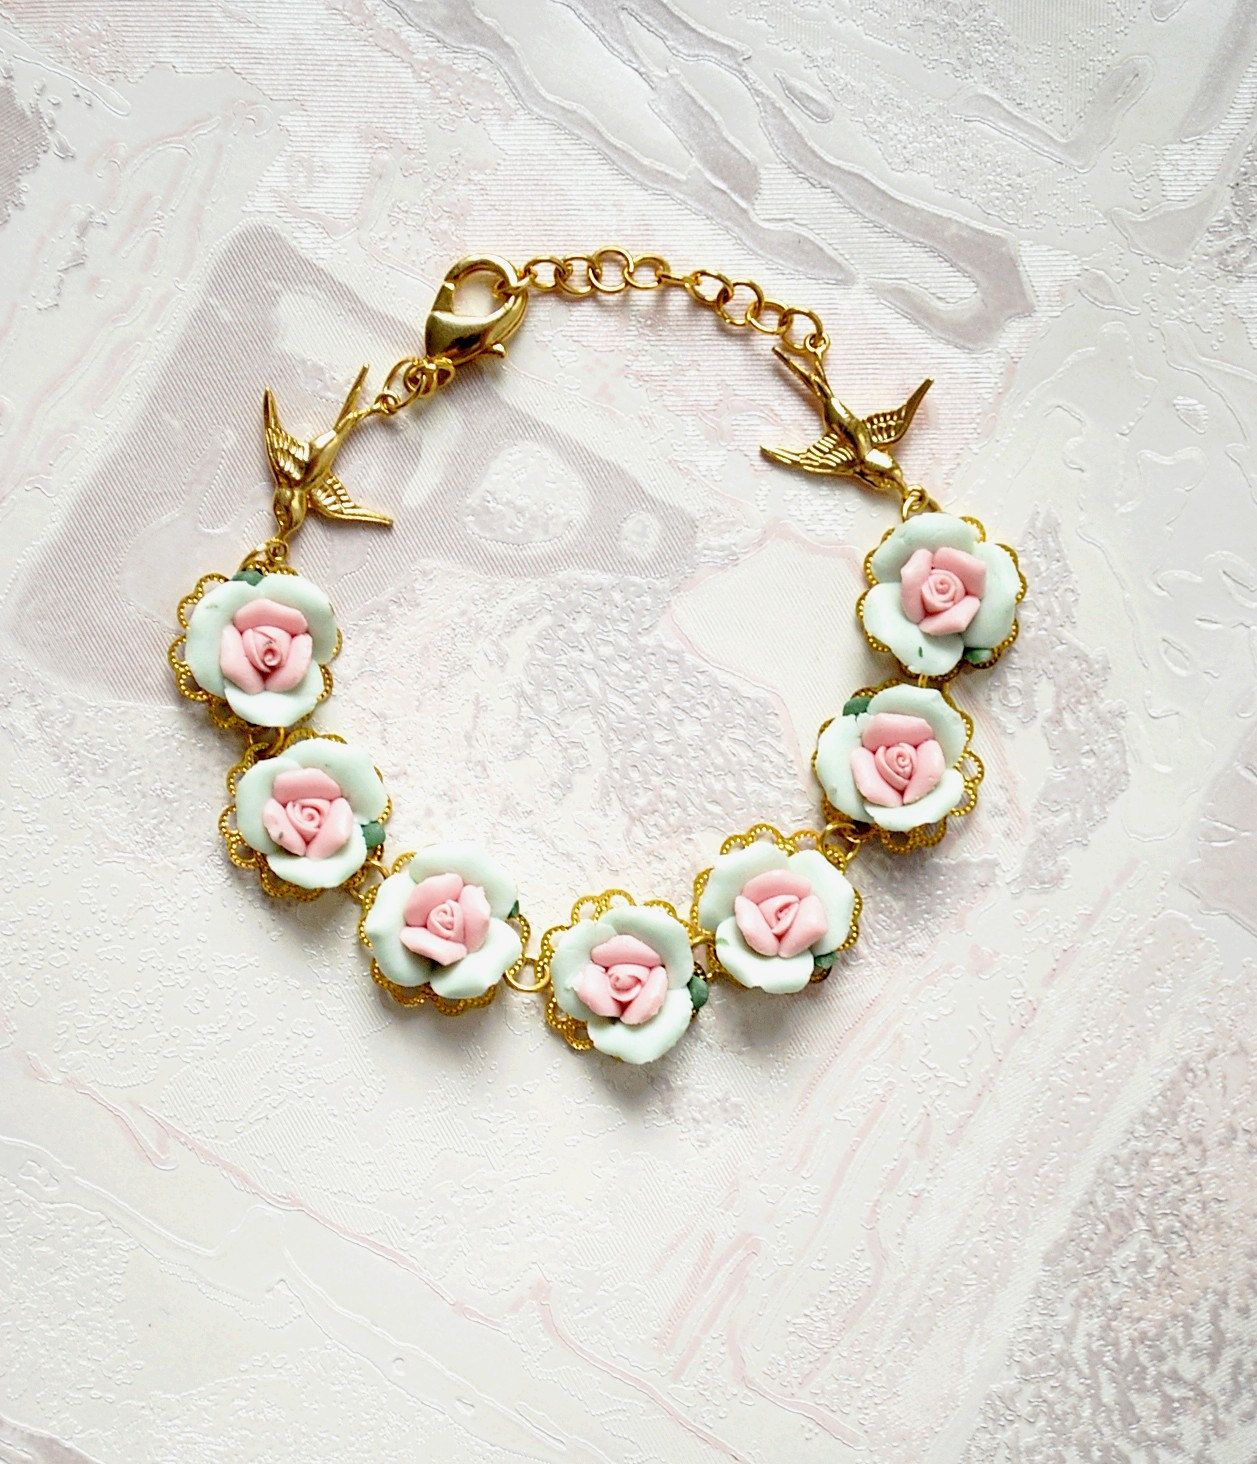 Pastel Powder Mint Pink Bracelet - Roses bracelet - Shabby chic  delicate and romantic bracelet - poetry of flowers - europe. CHF50,00, via Etsy.